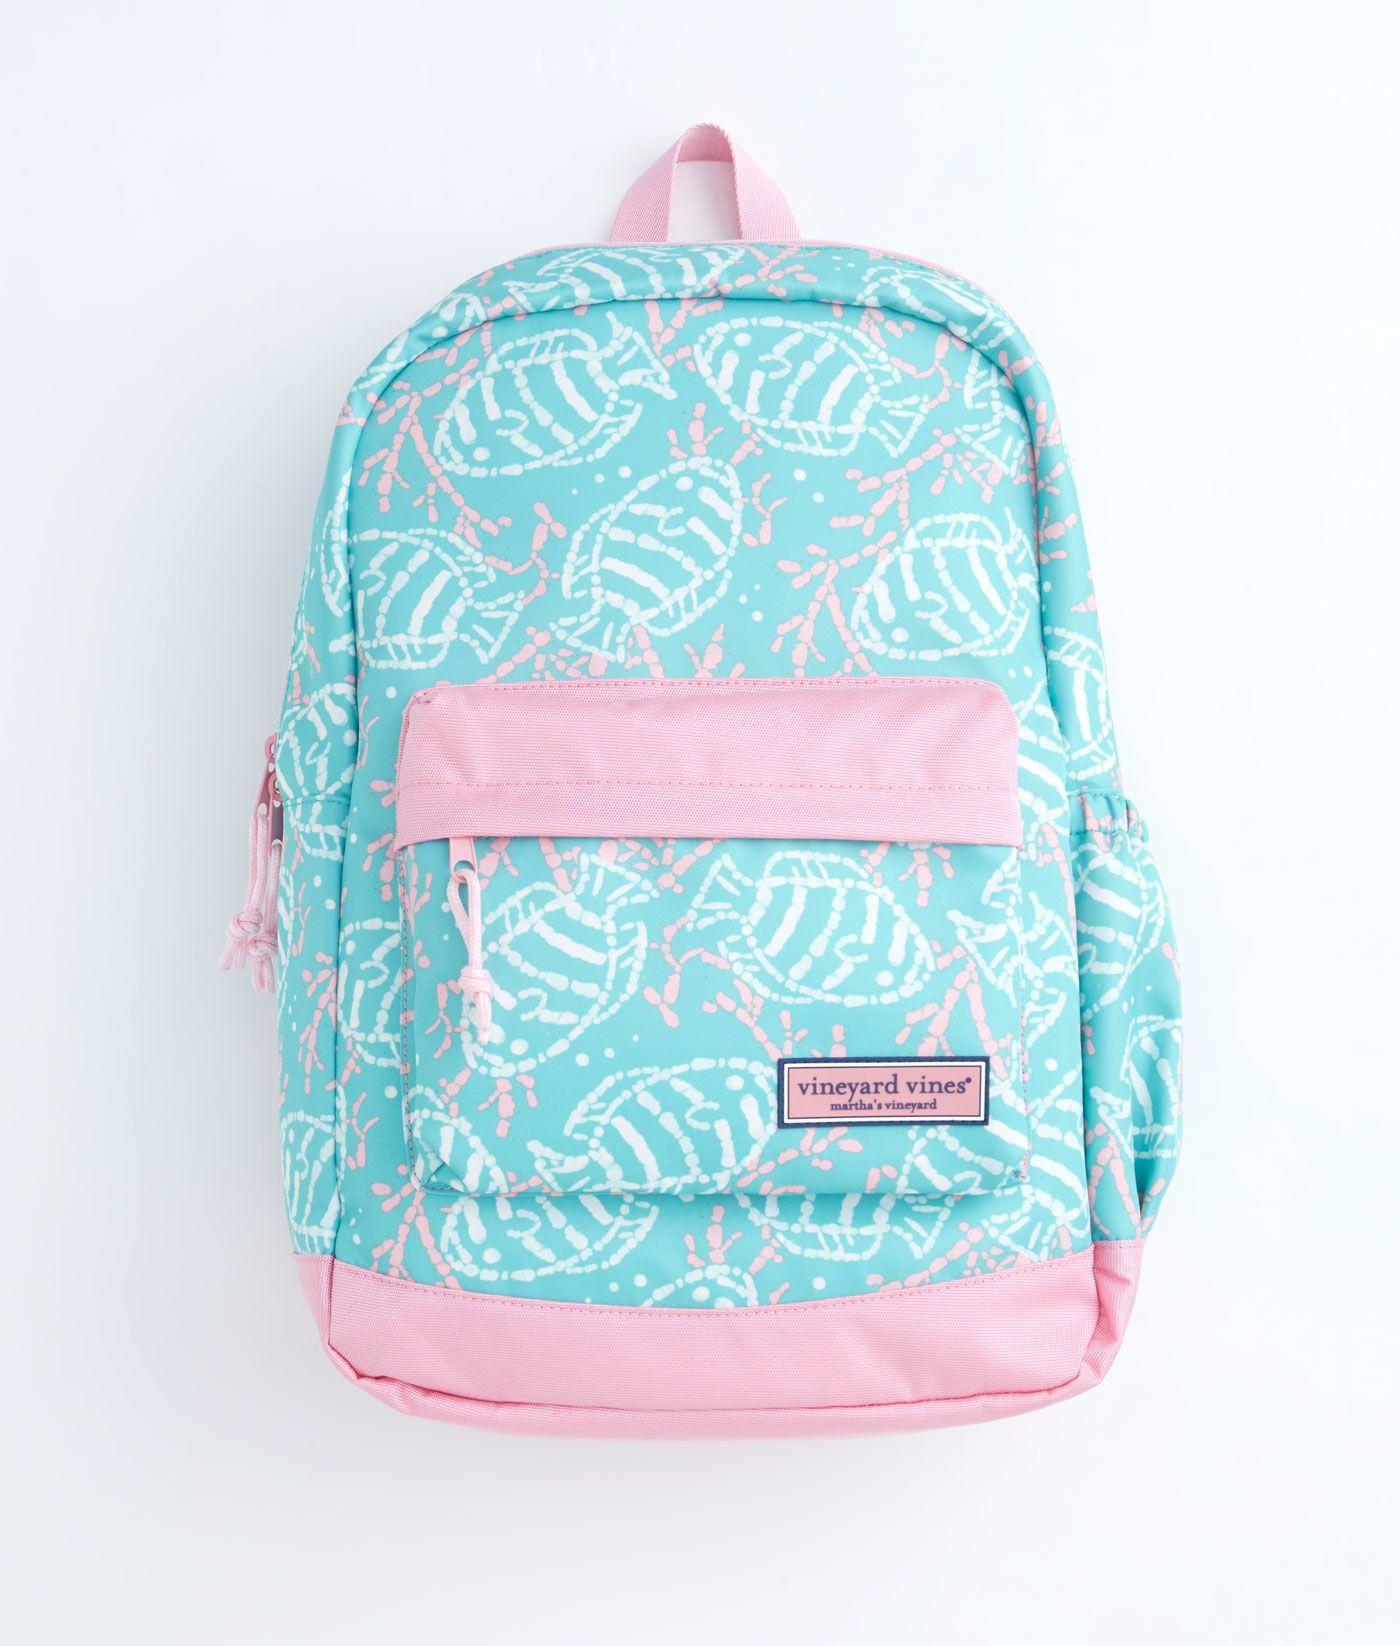 shop sealife backpack at vineyard vines school stuff pinterest